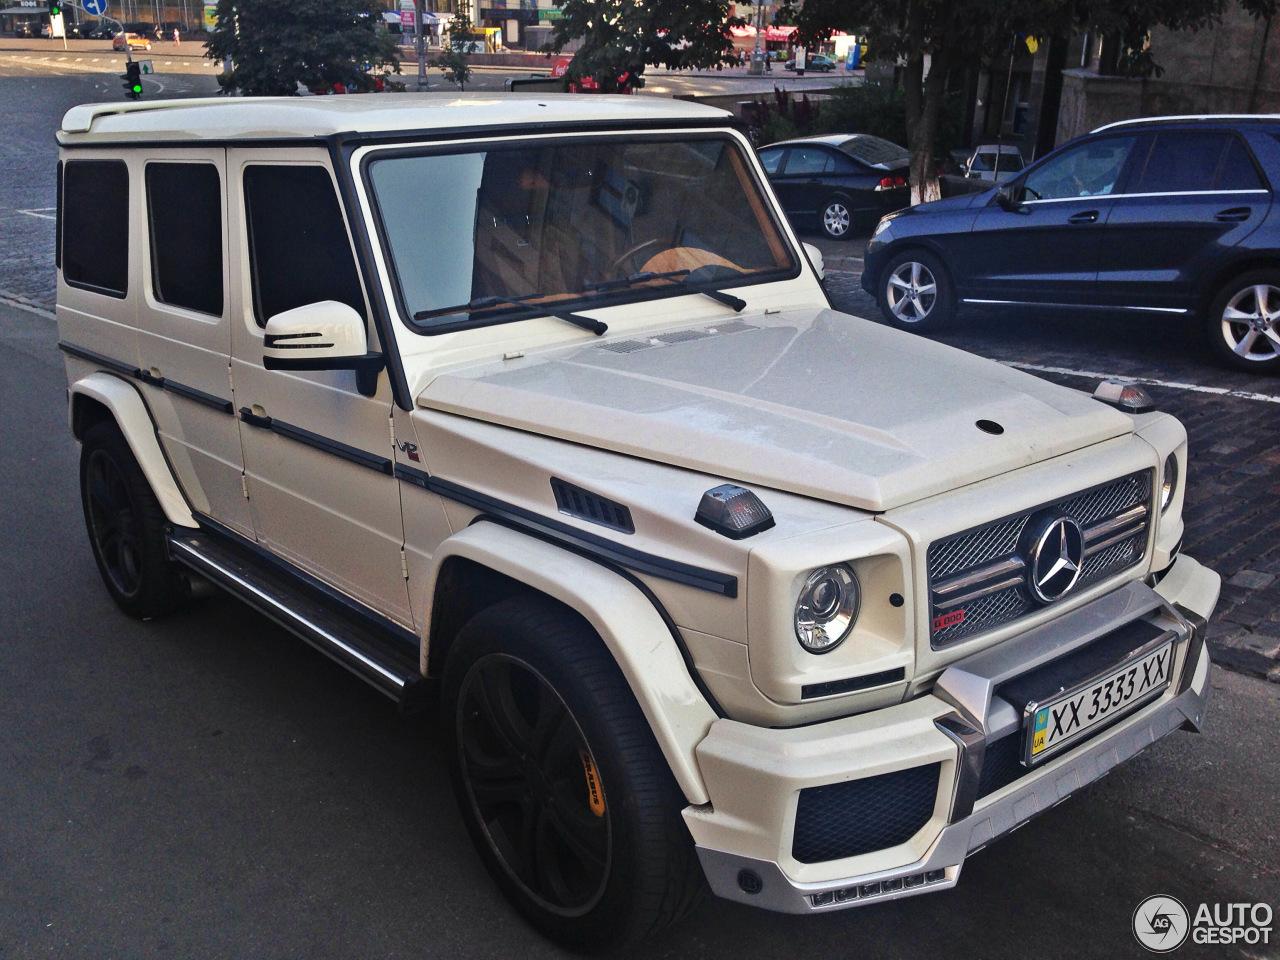 Mercedes benz brabus g 800 19 october 2014 autogespot for Mercedes benz brabus price